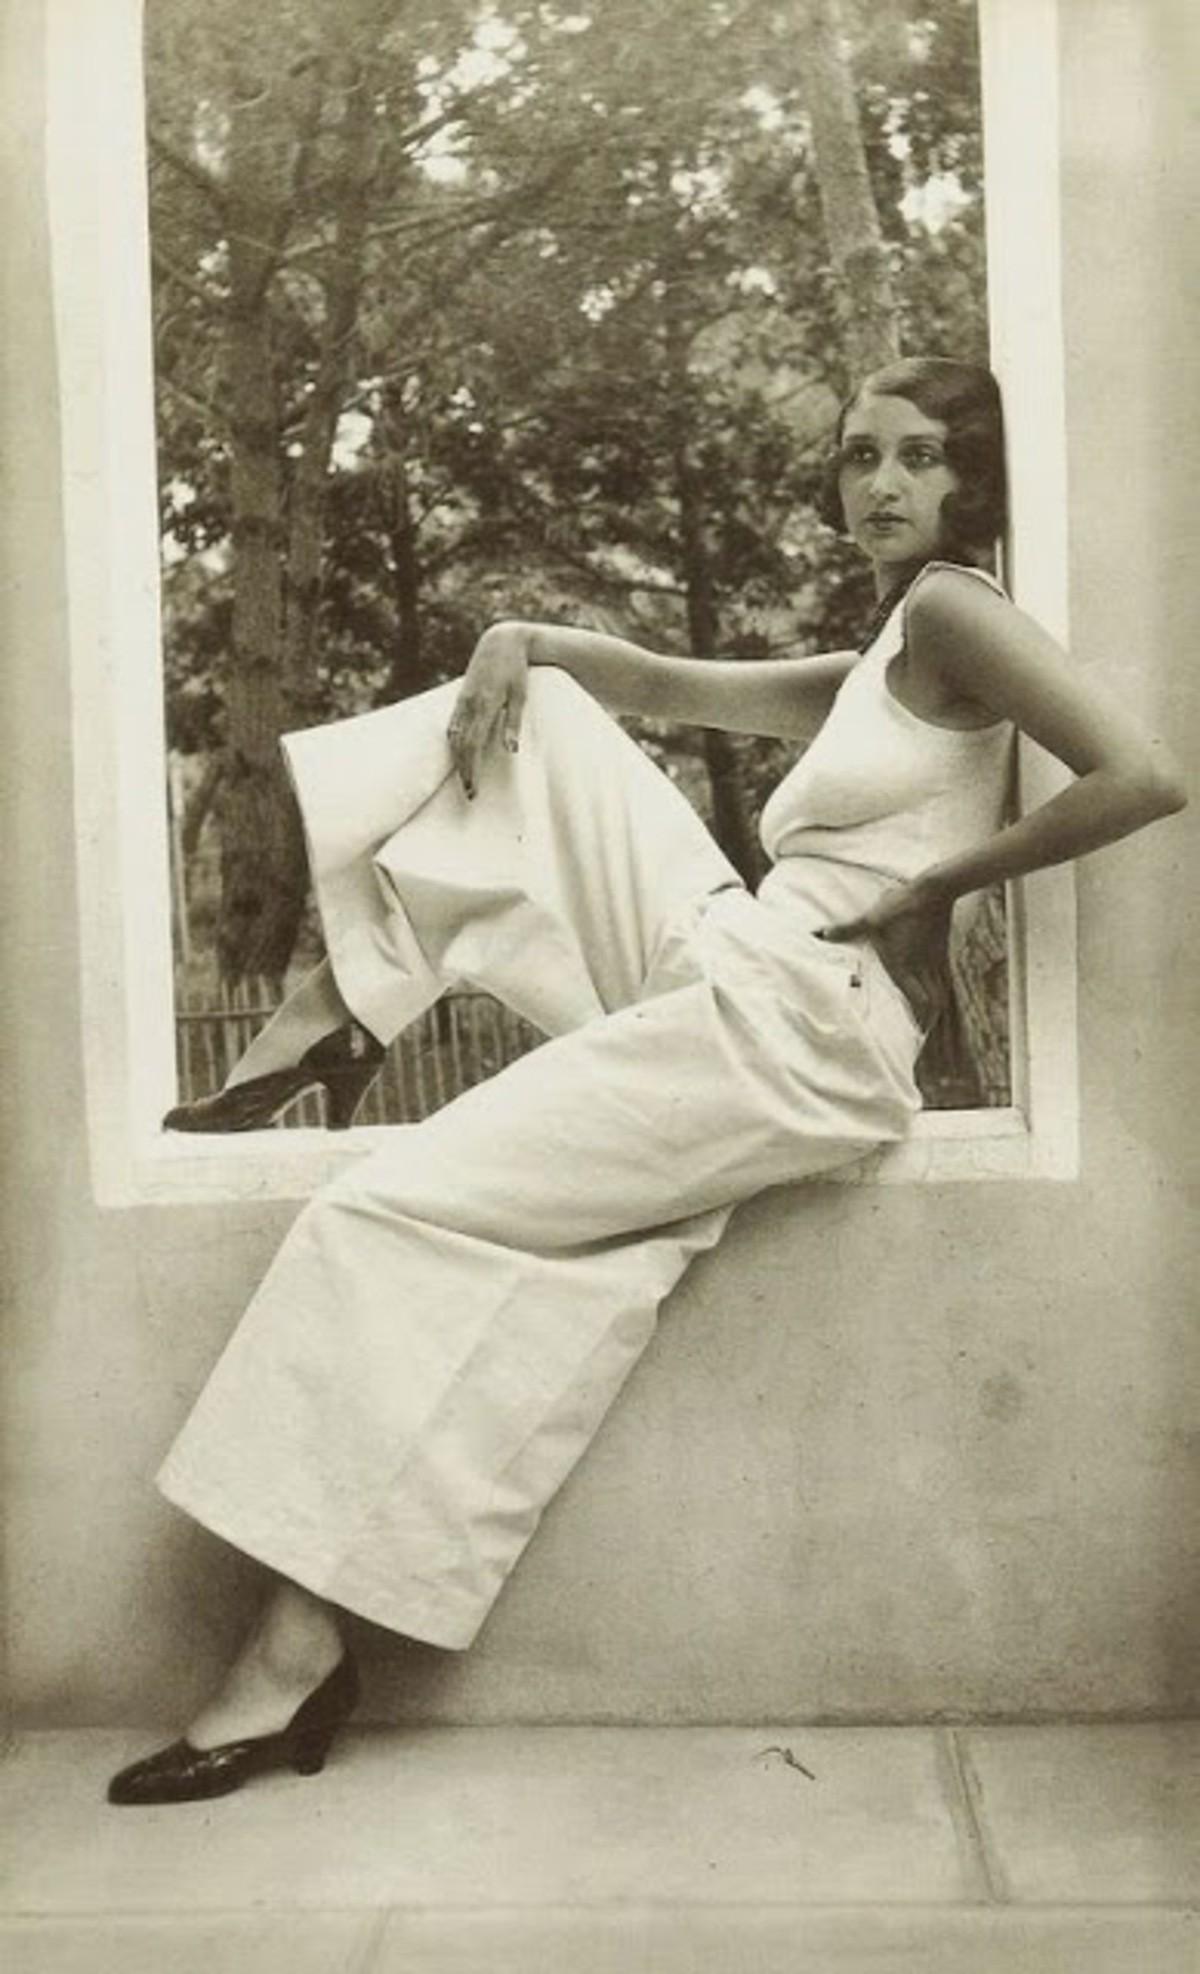 Renee Juan les Pins May 1930